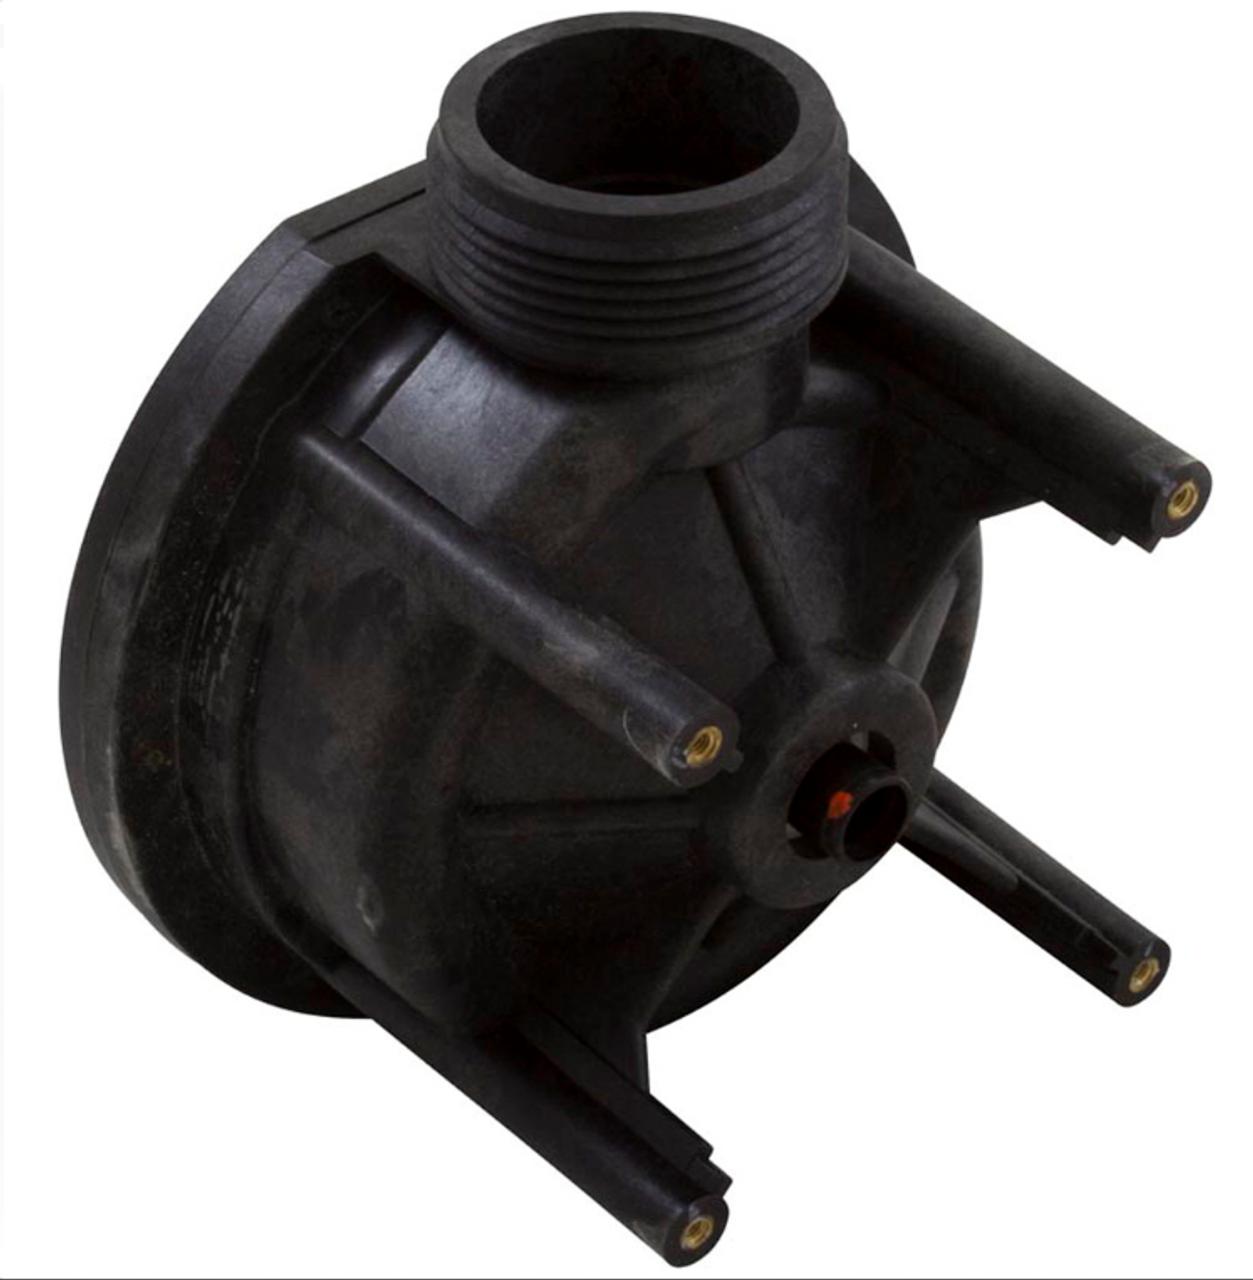 Gecko AquaFlo 1.5hp Pump Impeller FMCP,FMHP,TMCP 48 Frame 91693651